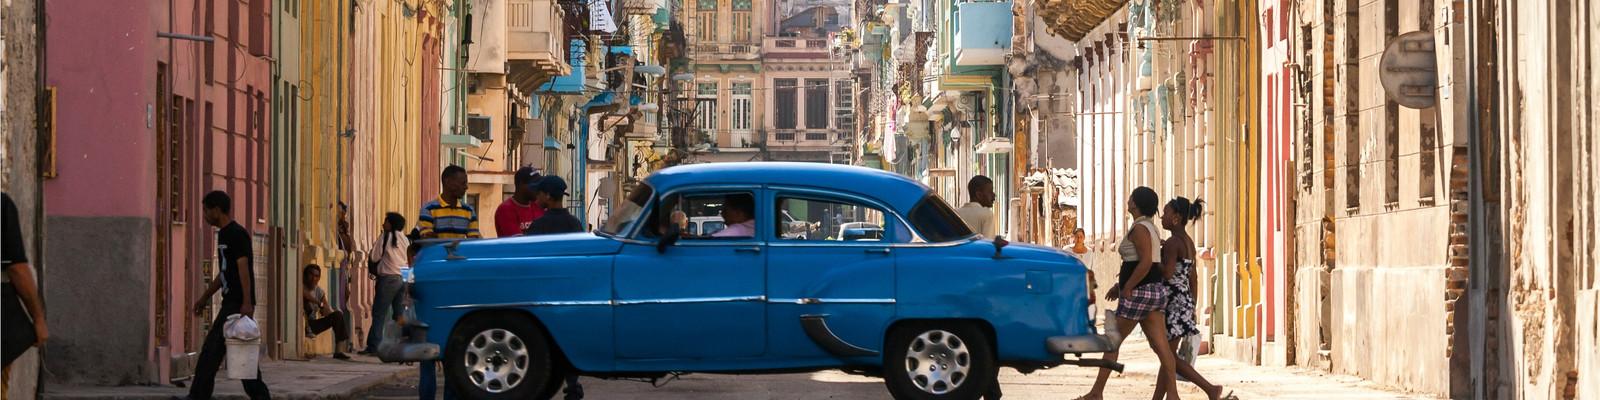 Foto Centraal Amerika reizen